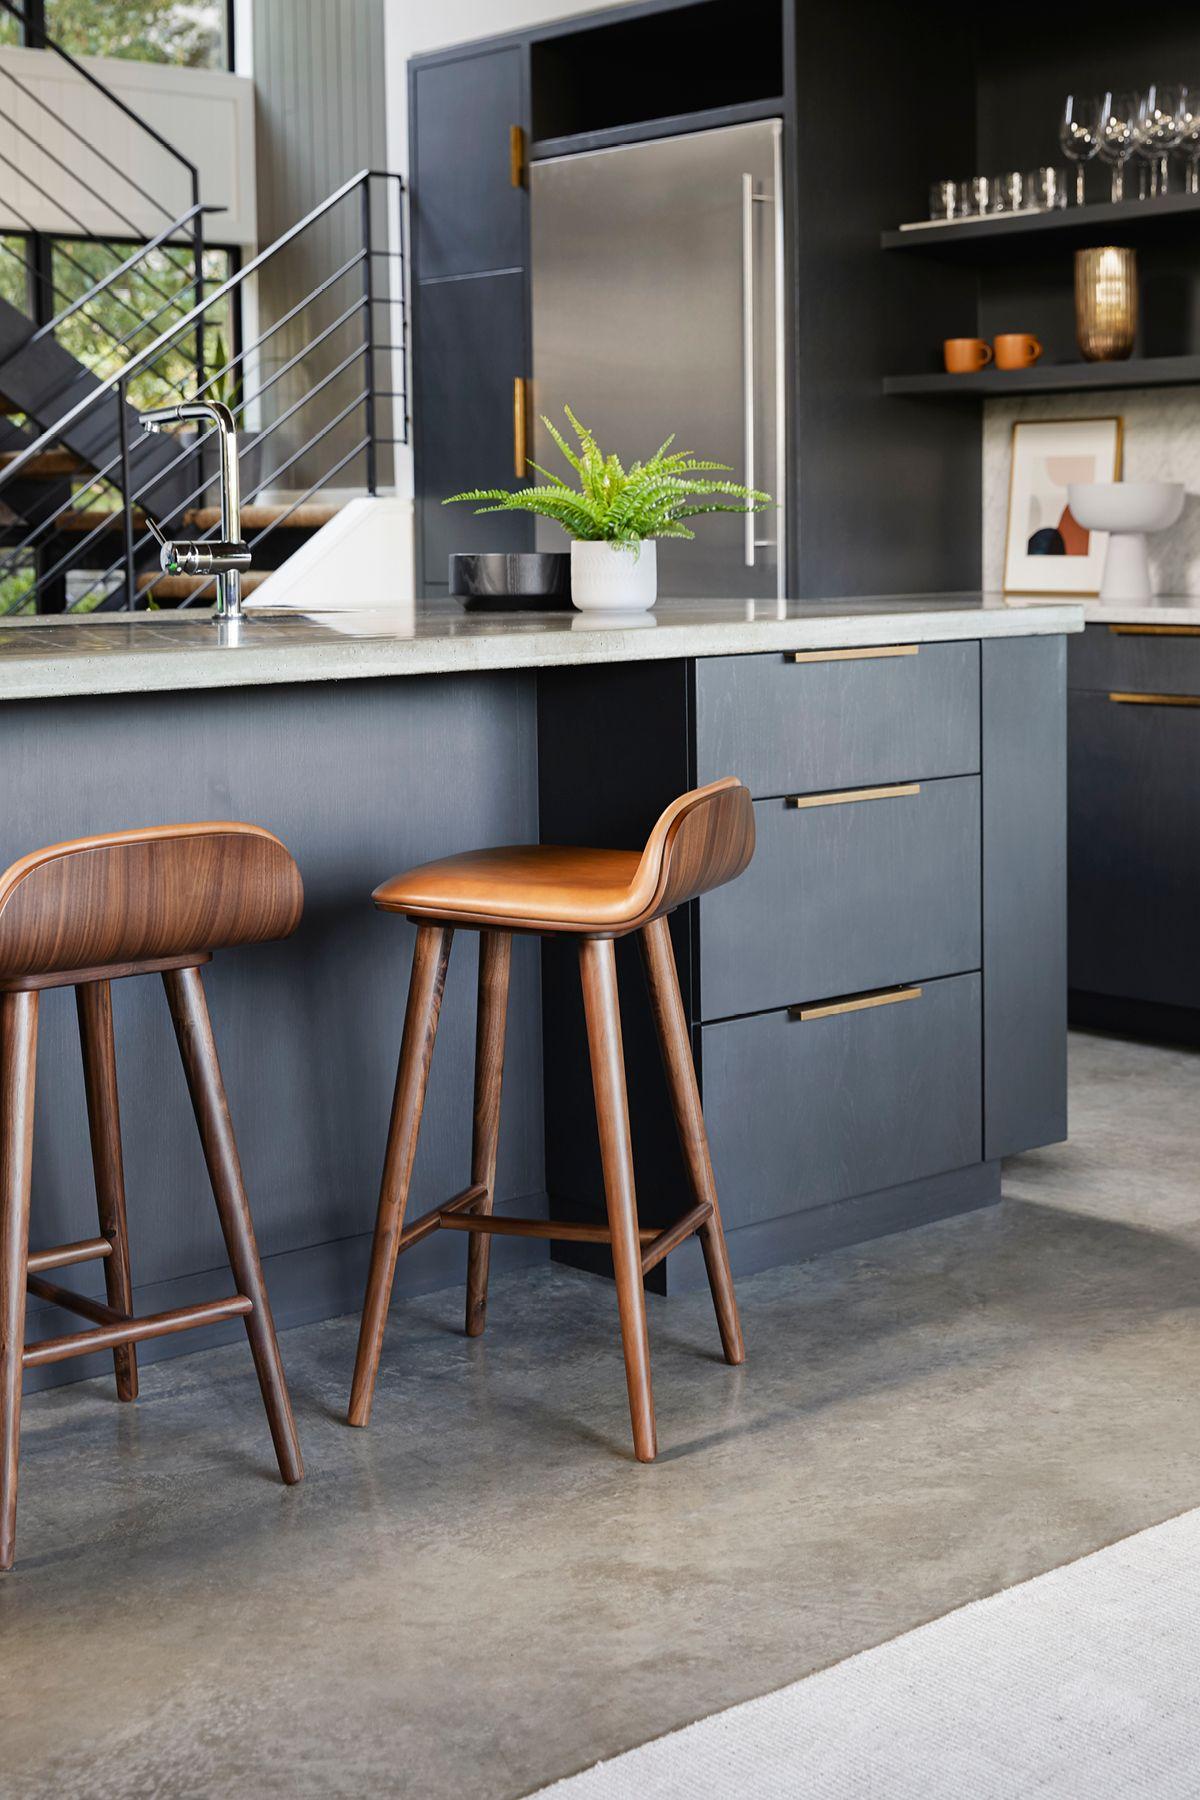 Sede Stool Stools For Kitchen Island Kitchen Remodel Kitchen Design